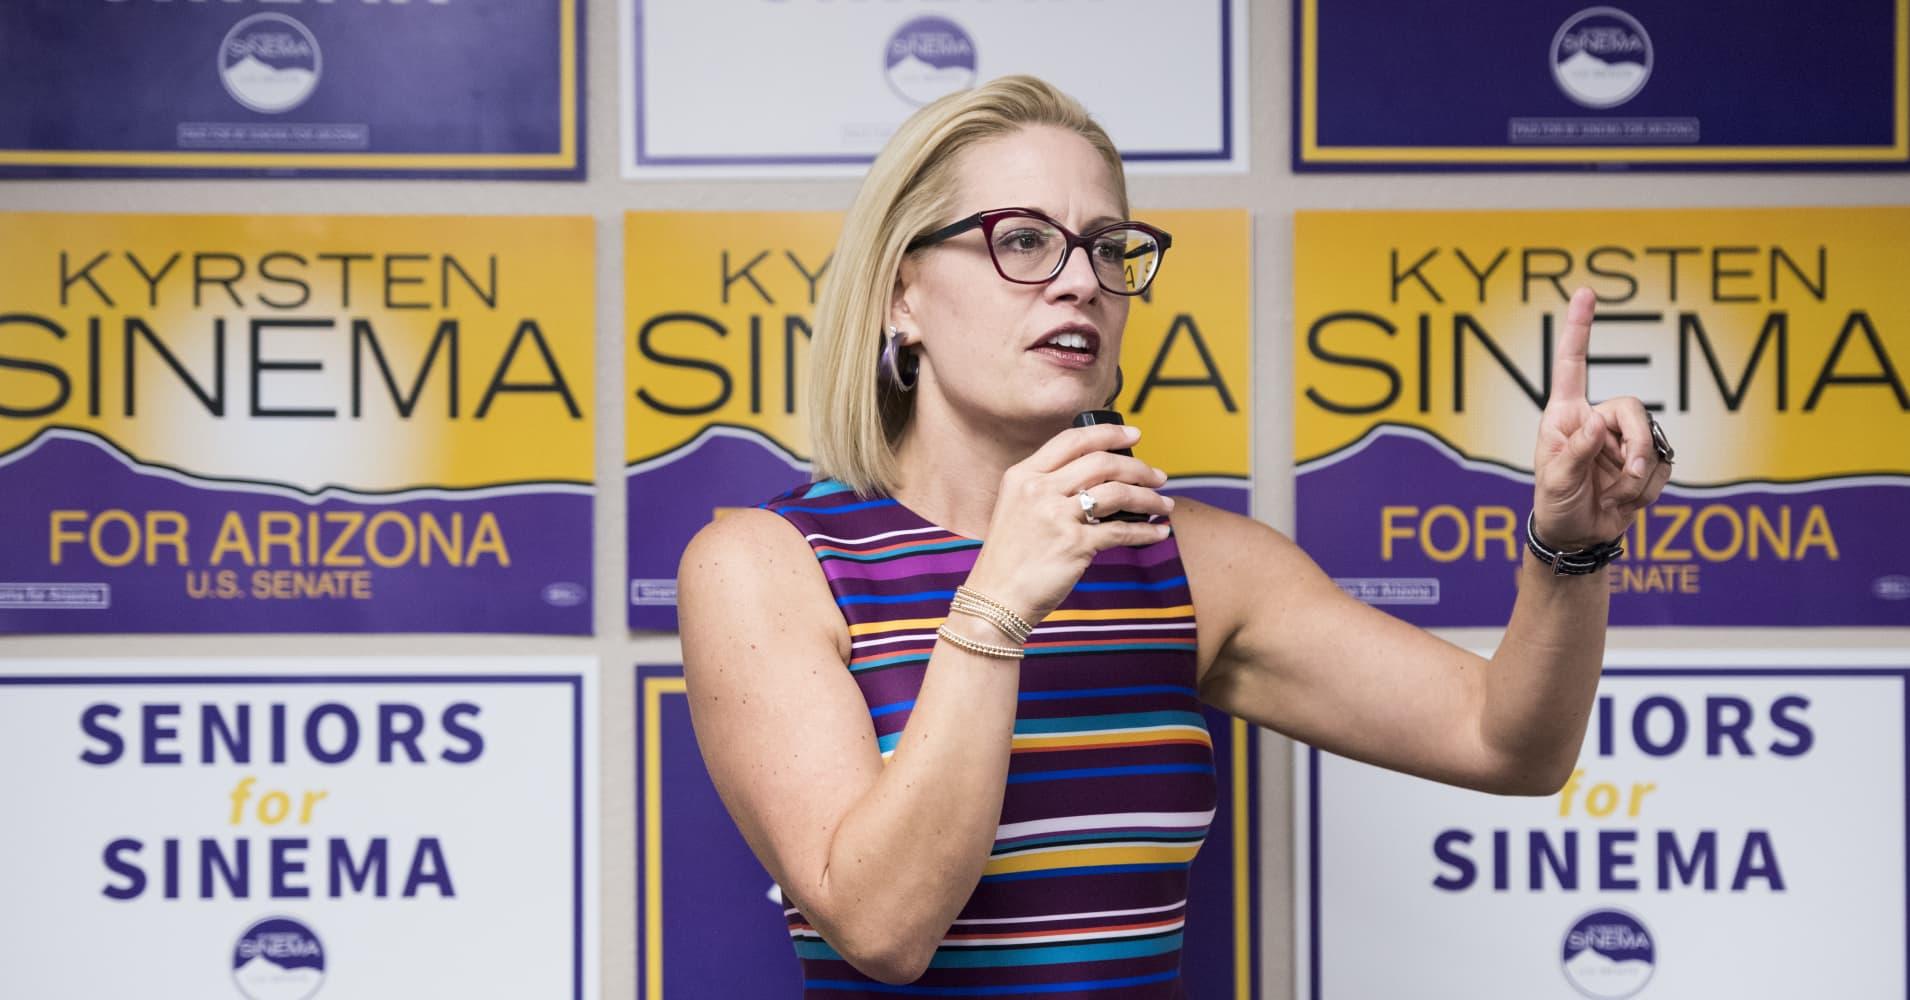 Democrat Kyrsten Sinema is the apparent winner of Arizona Senate race: NBC News